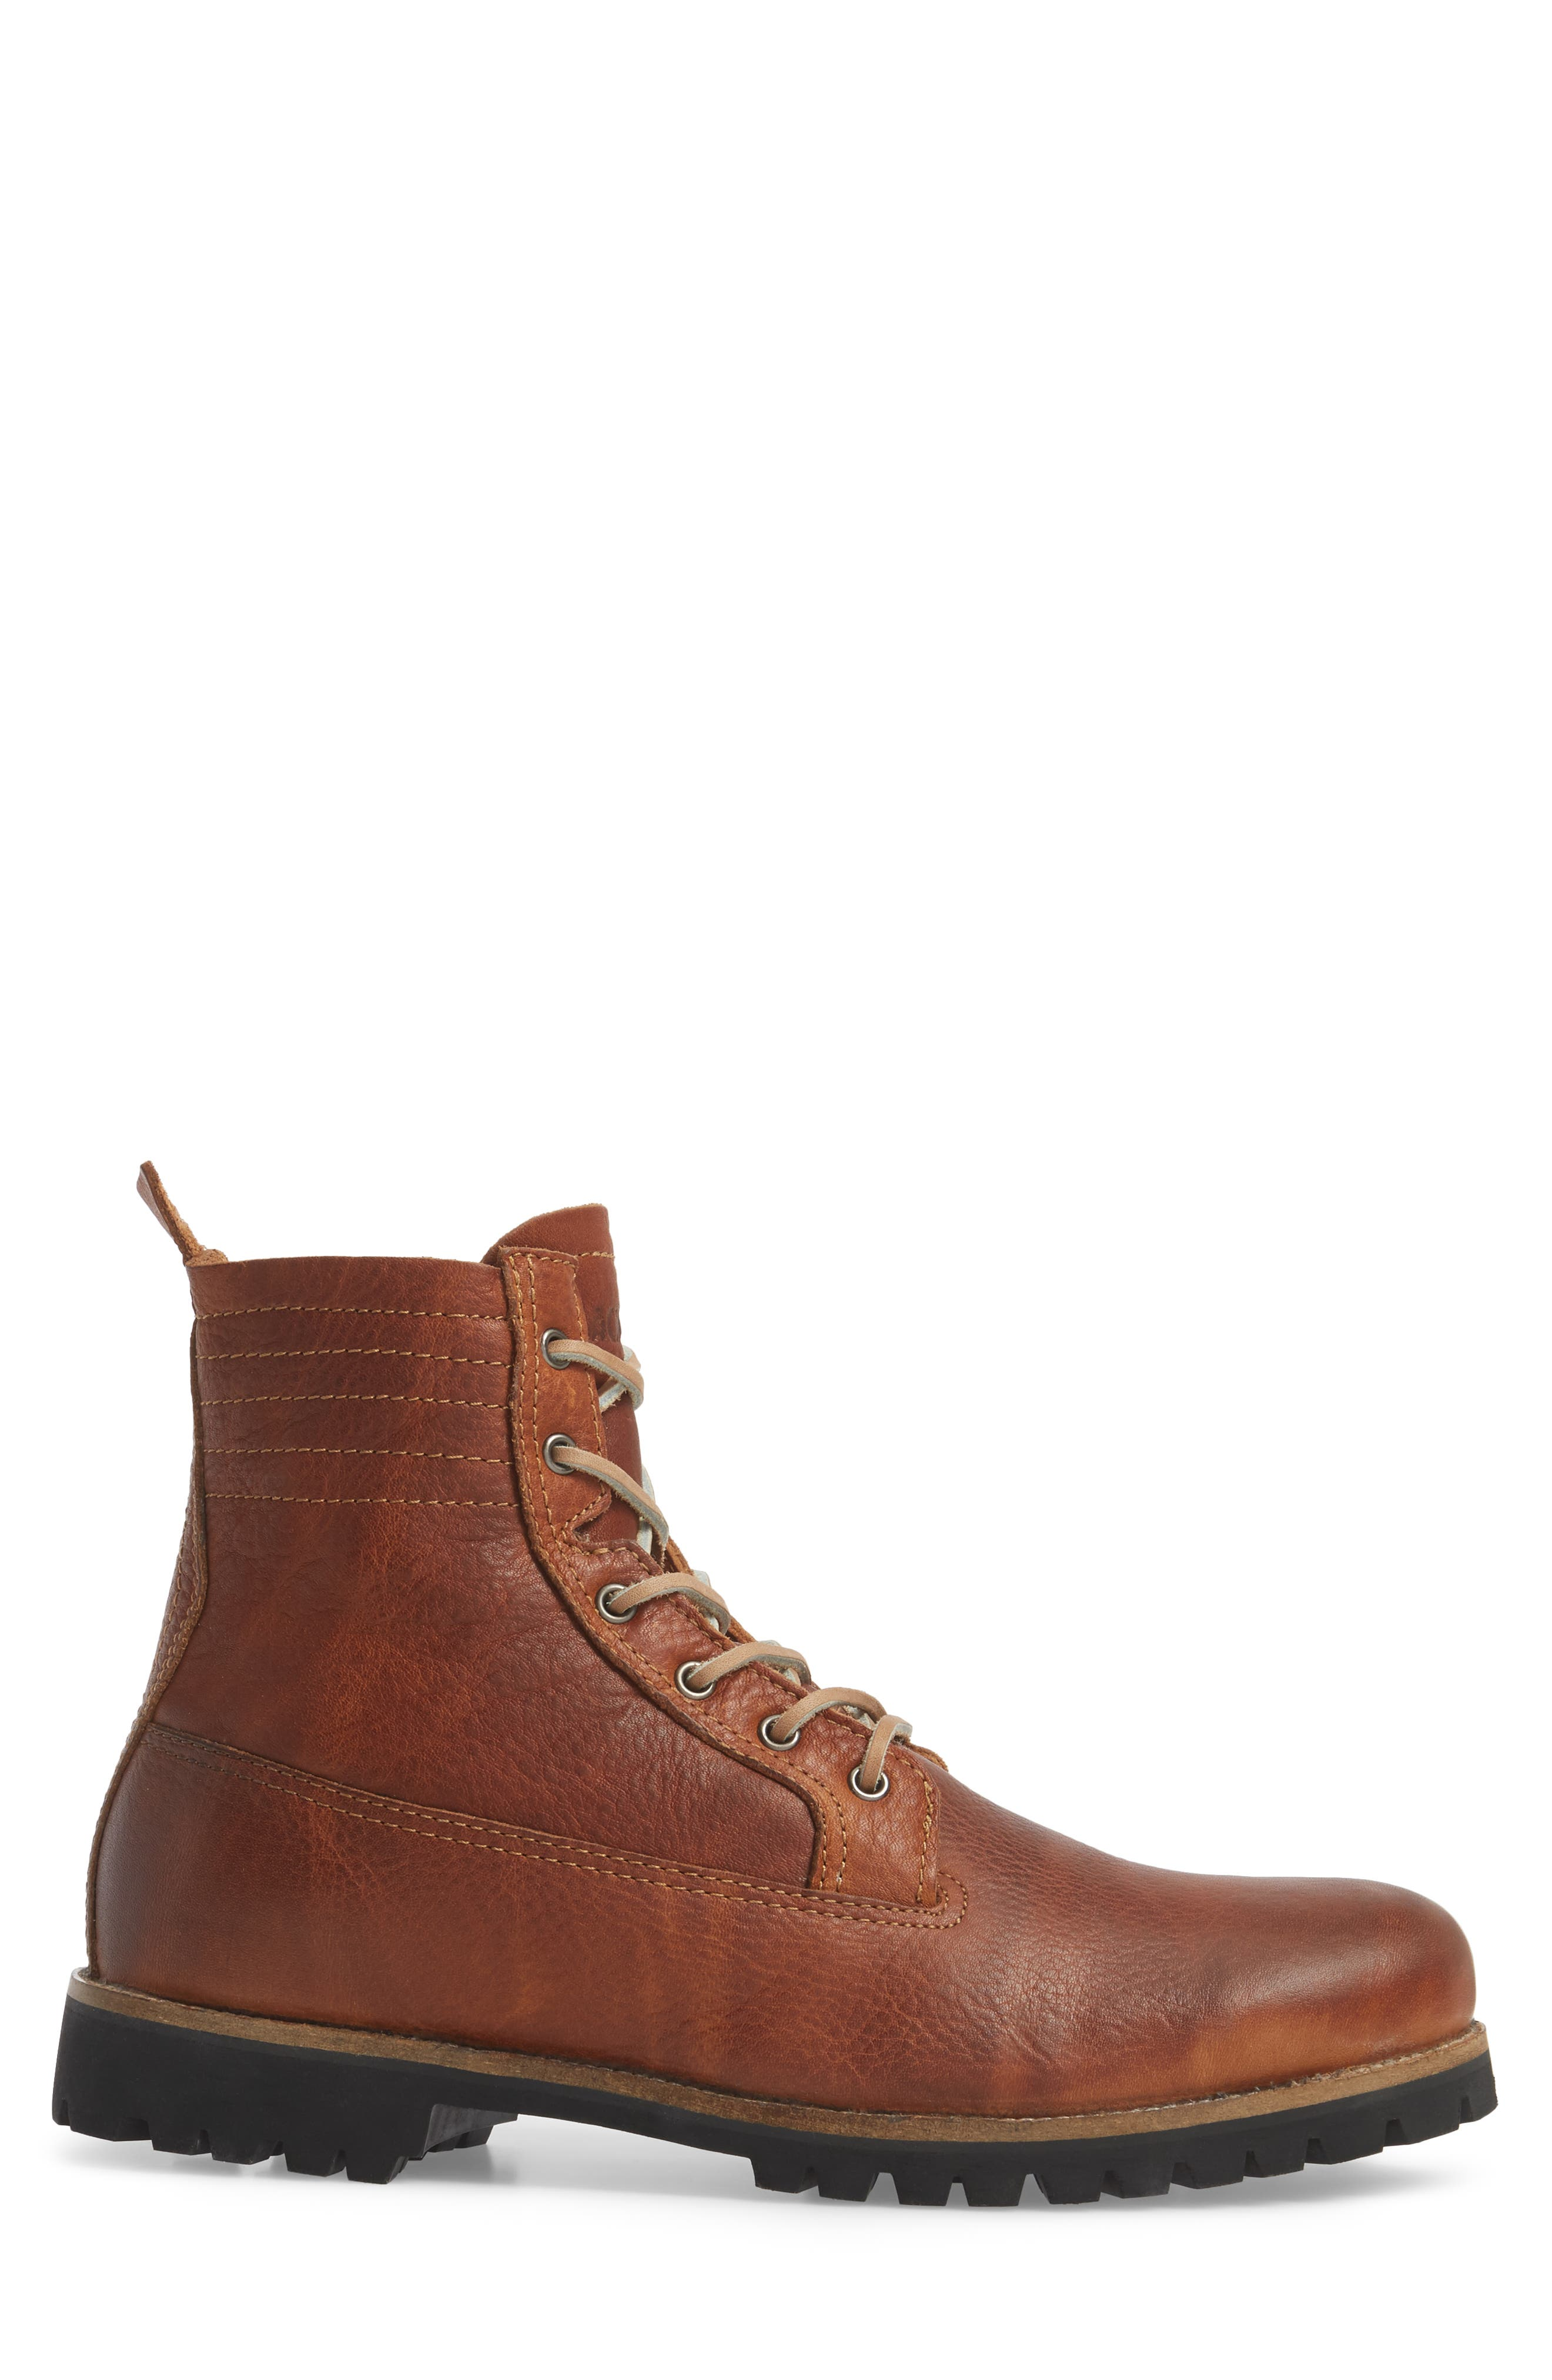 Alternate Image 3  - Blackstone IM 12 Plain Toe Boot with Genuine Shearling (Men)